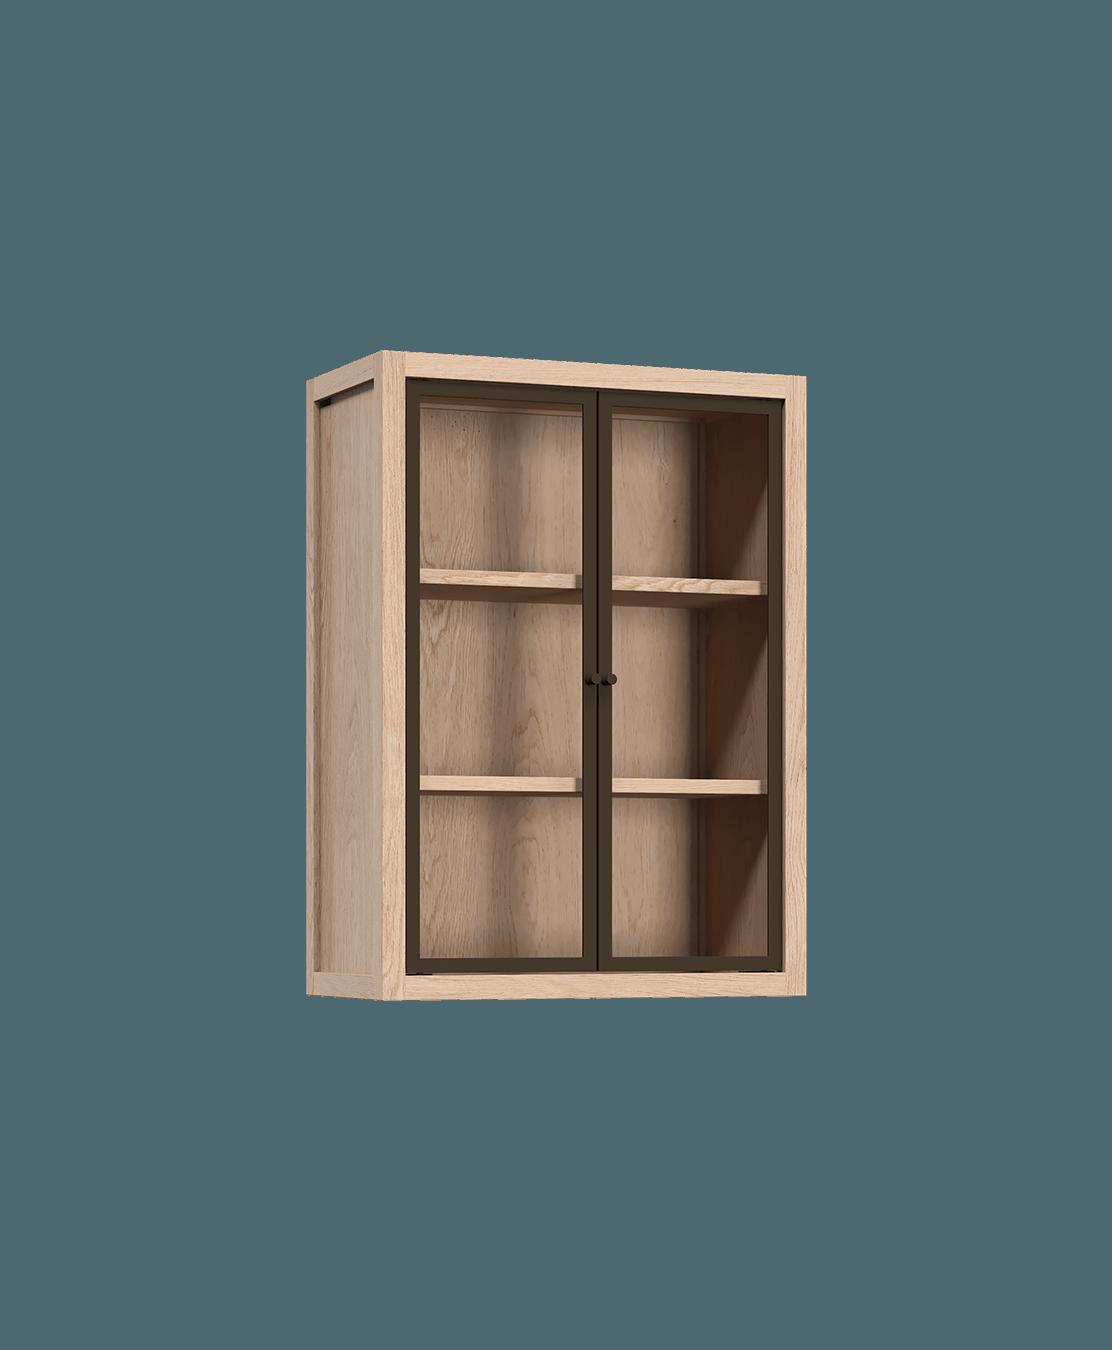 free download Radix Wall Kitchen Cabinet